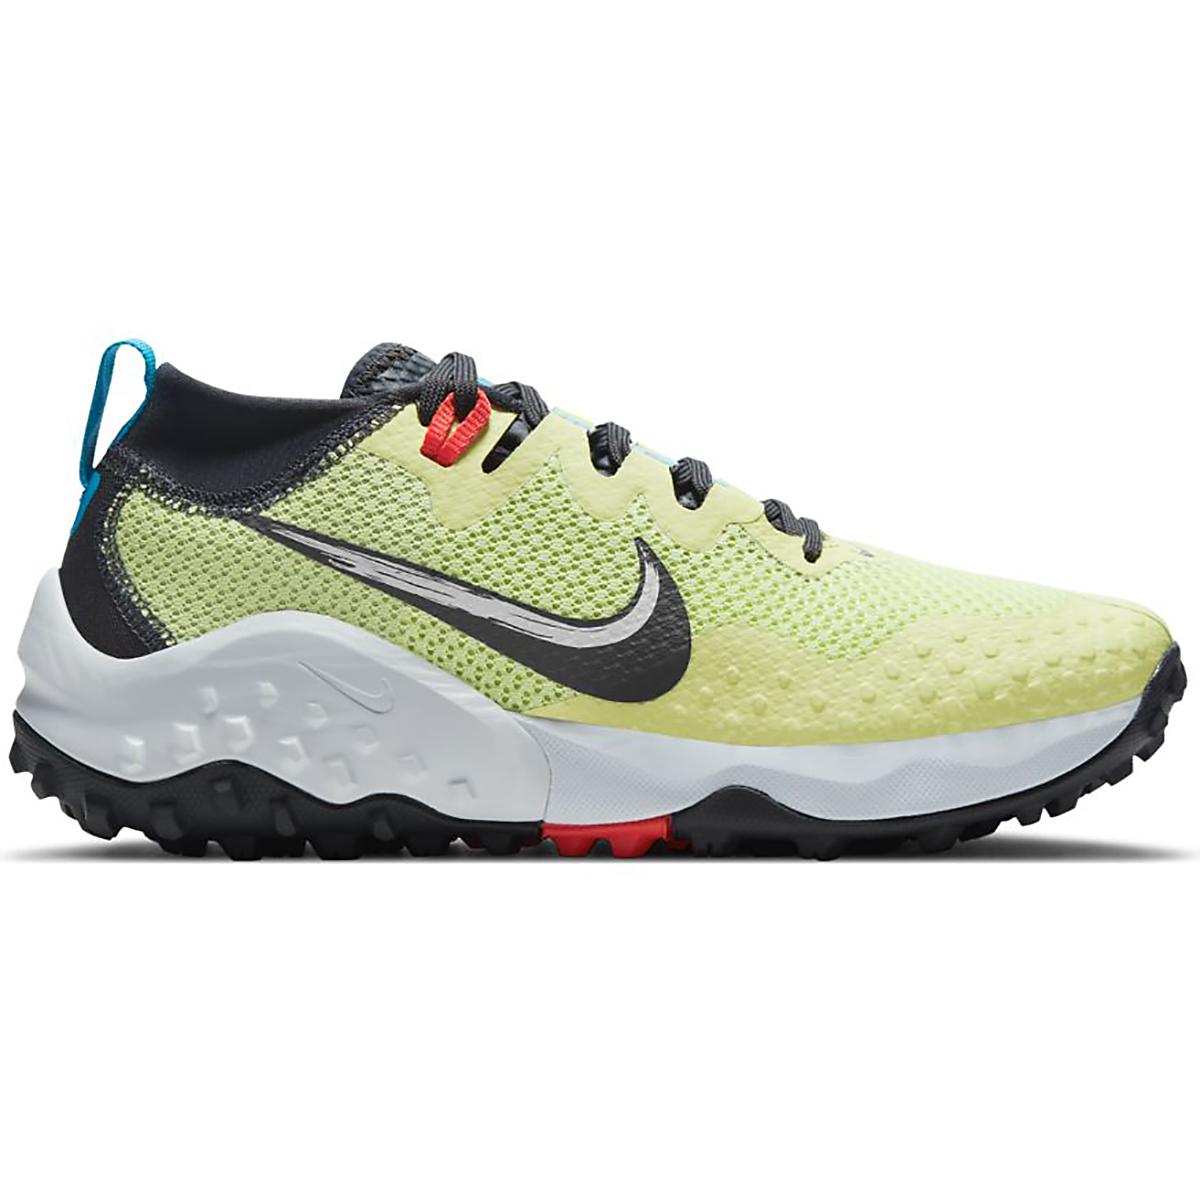 Women's Nike Wildhorse 7 Trail Running Shoe - Color: Limelight/Off Noir-Laser Blue-Chile Red - Size: 5 - Width: Regular, Limelight/Off Noir-Laser Blue-Chile Red, large, image 1